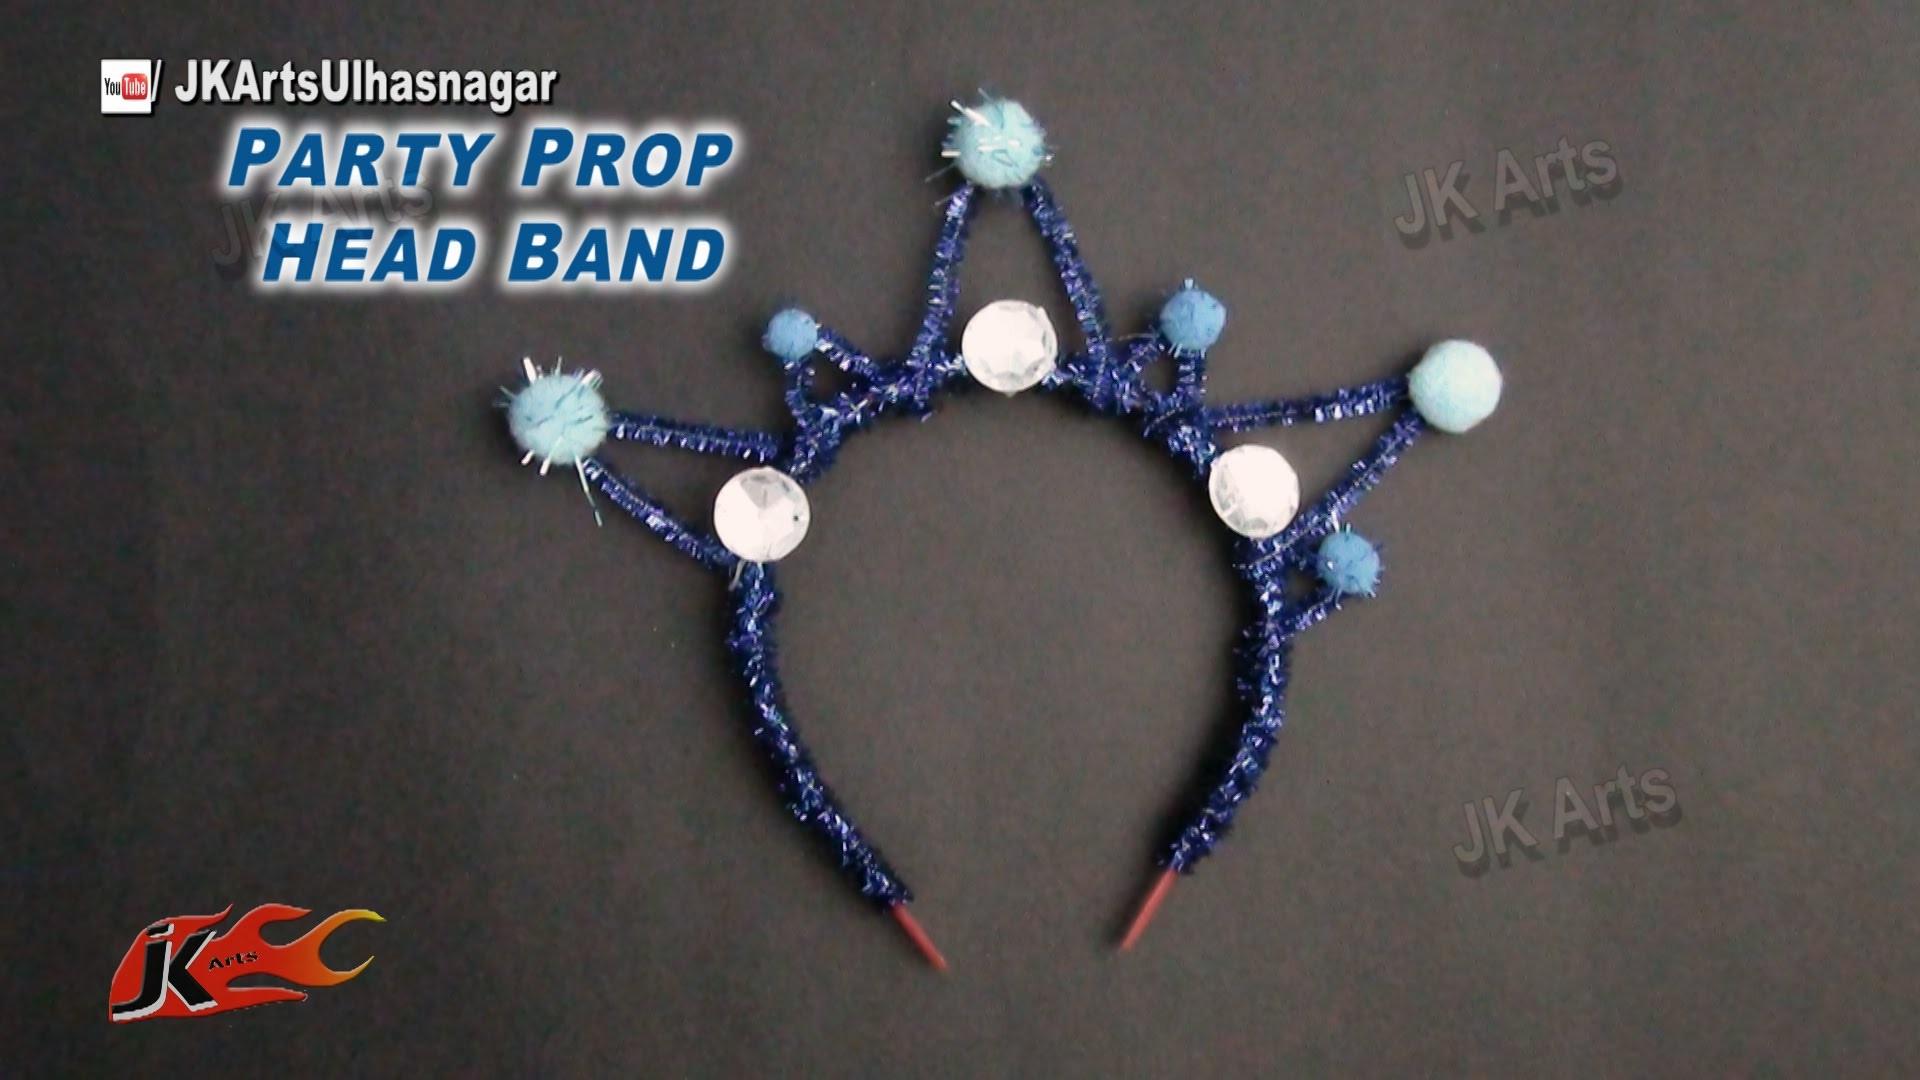 DIY Party Prop Hairband.Headband for New Year, Christmas, Birthday | JK Arts 808